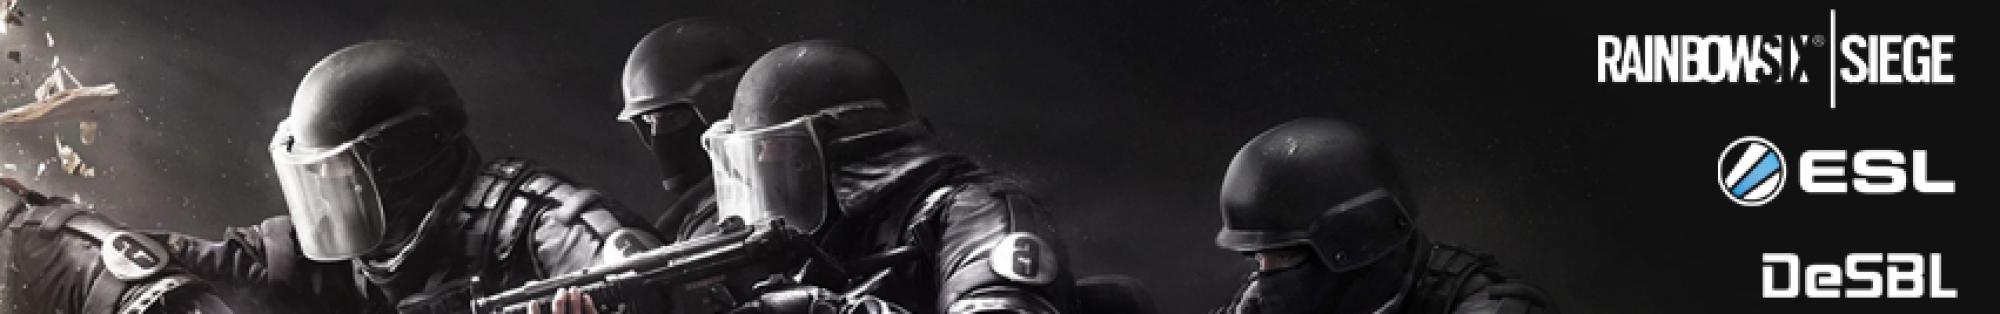 [V1C] Victory eSports [VIC]